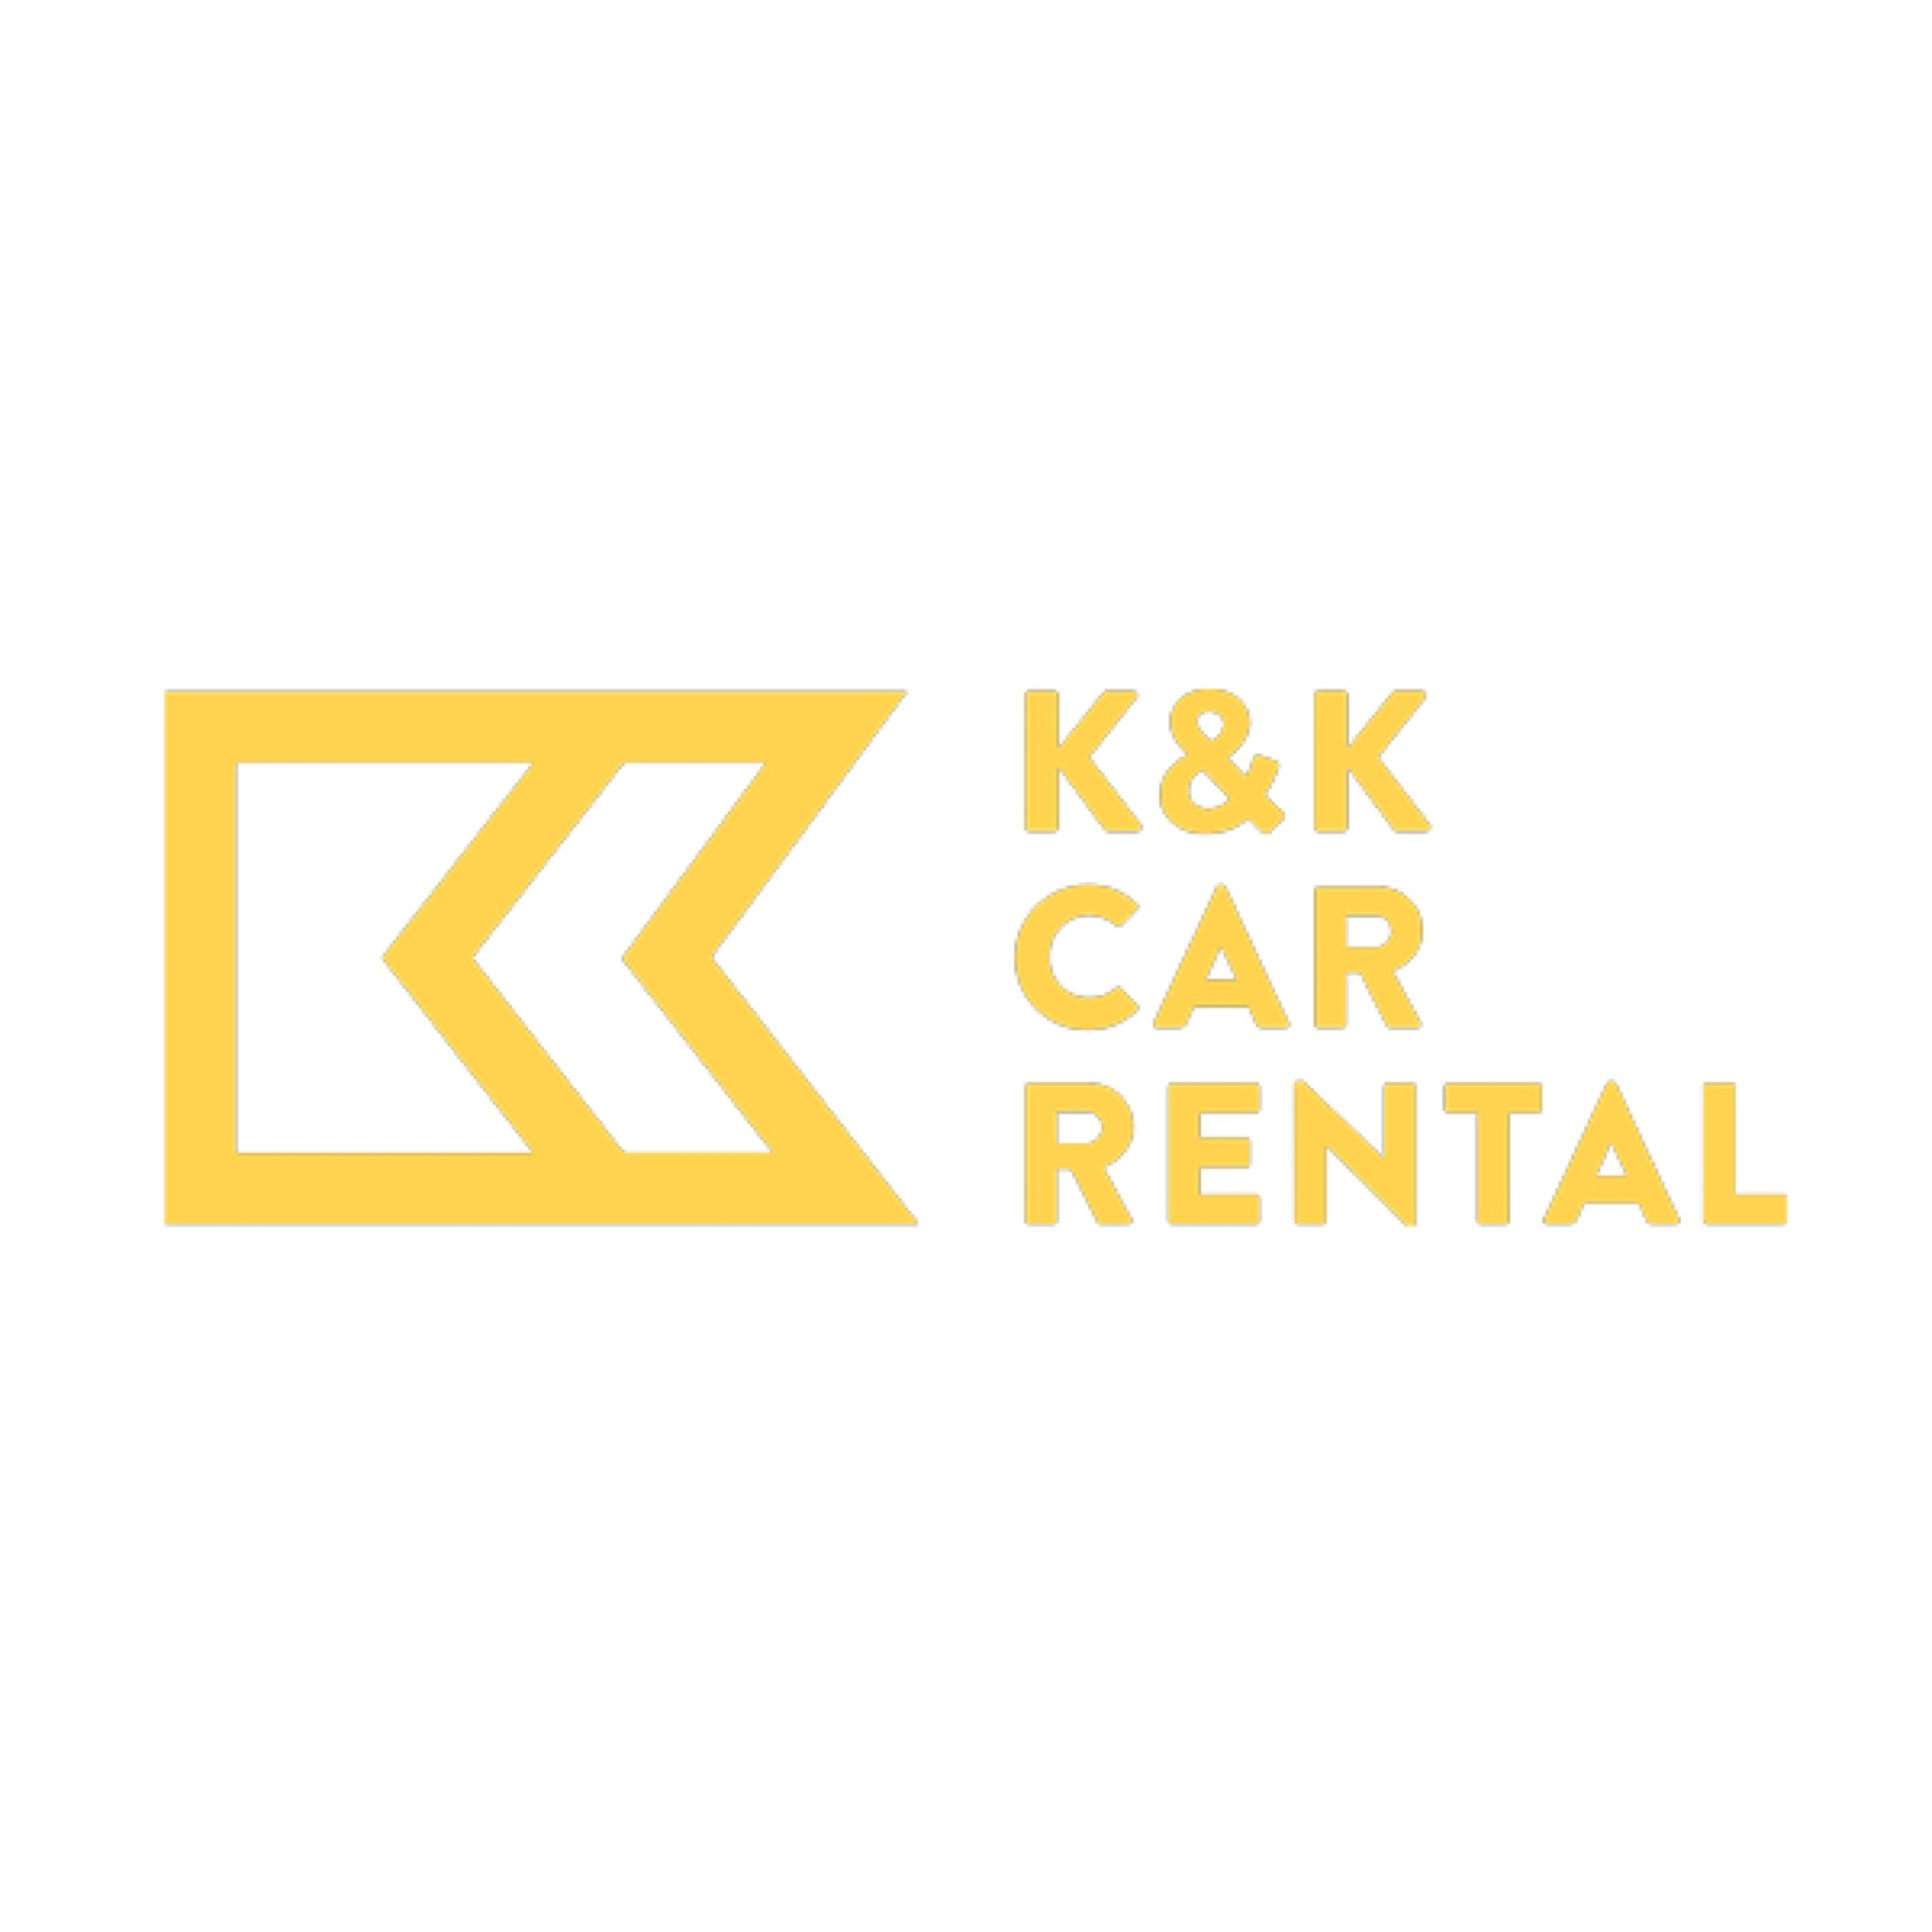 K&K car rental